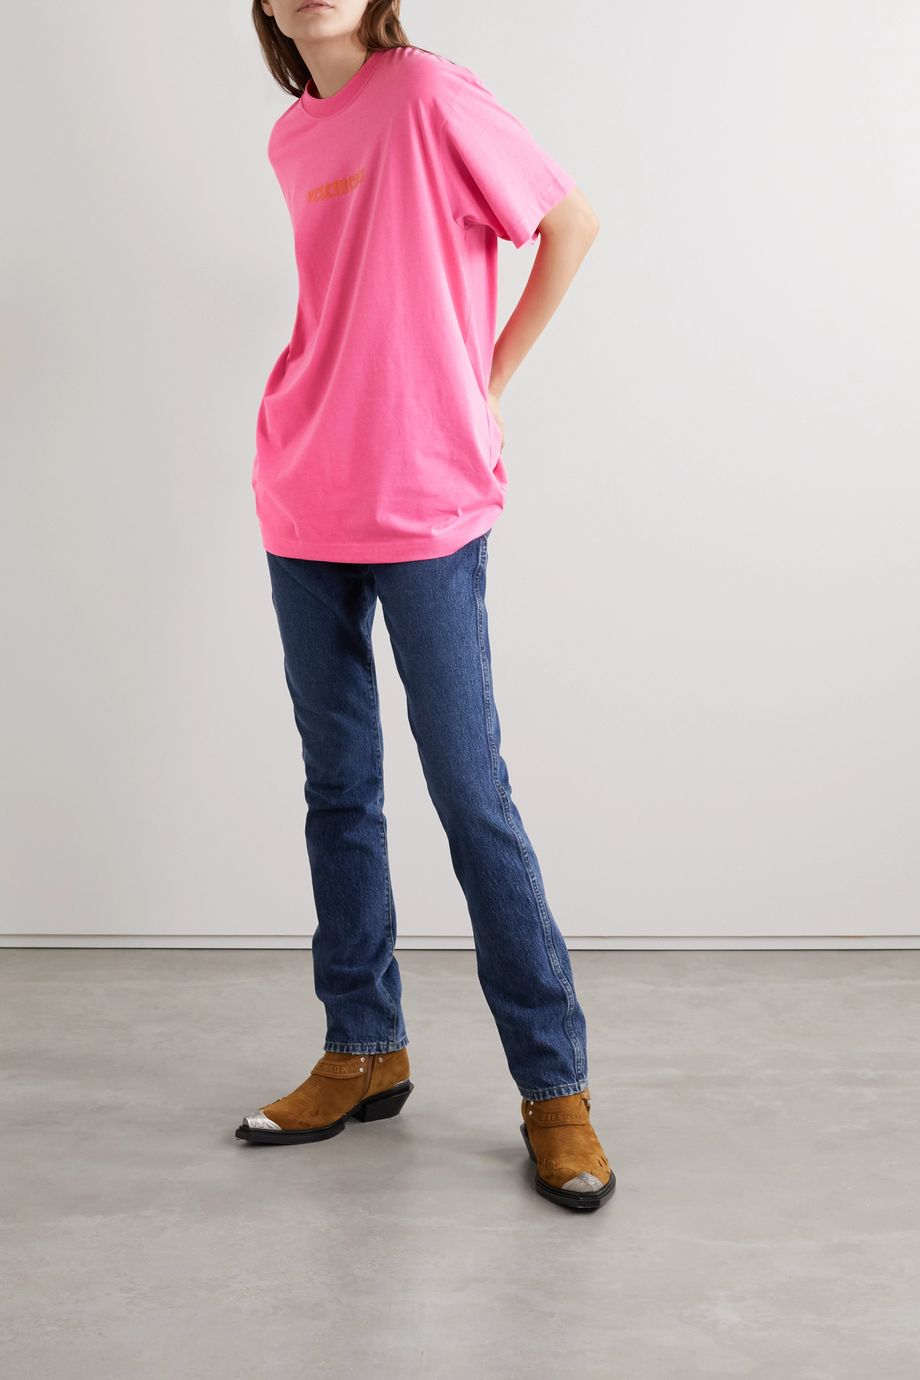 Vetements Oversized appliquéd jersey T-shirt